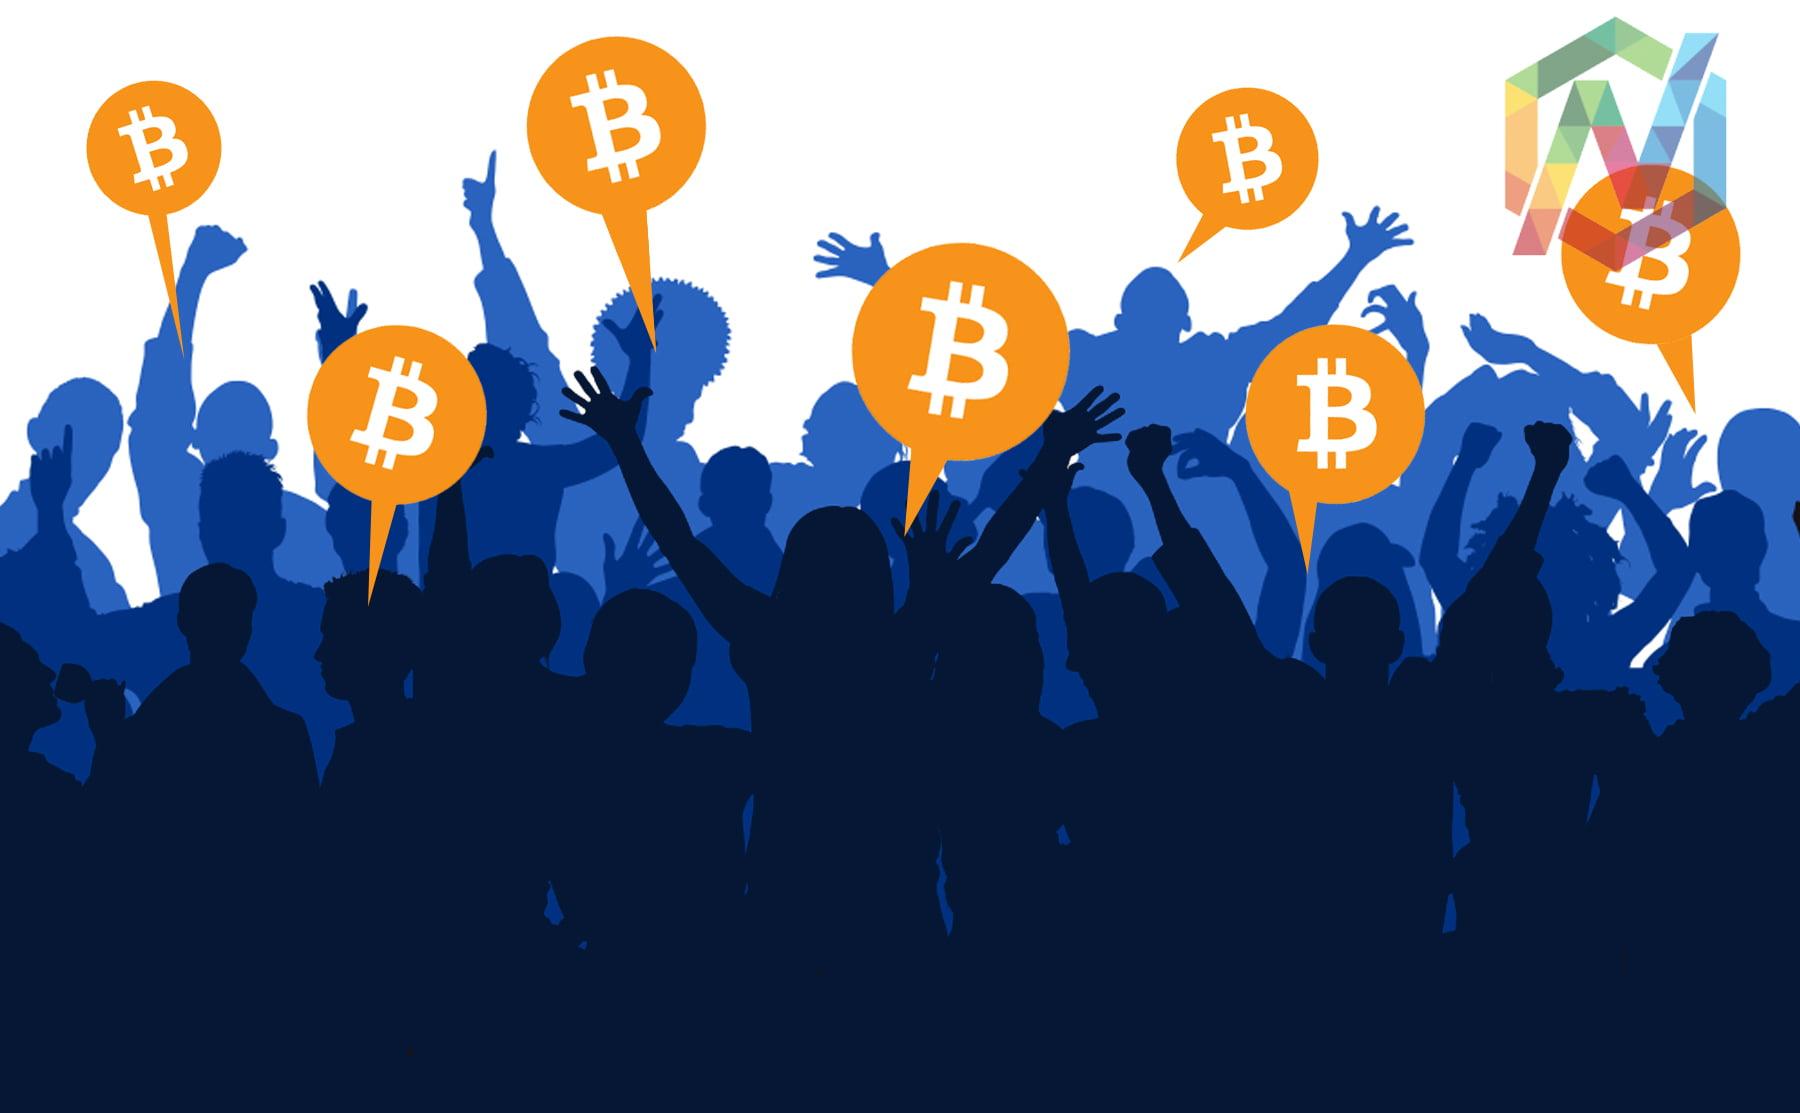 cryptocurrency community